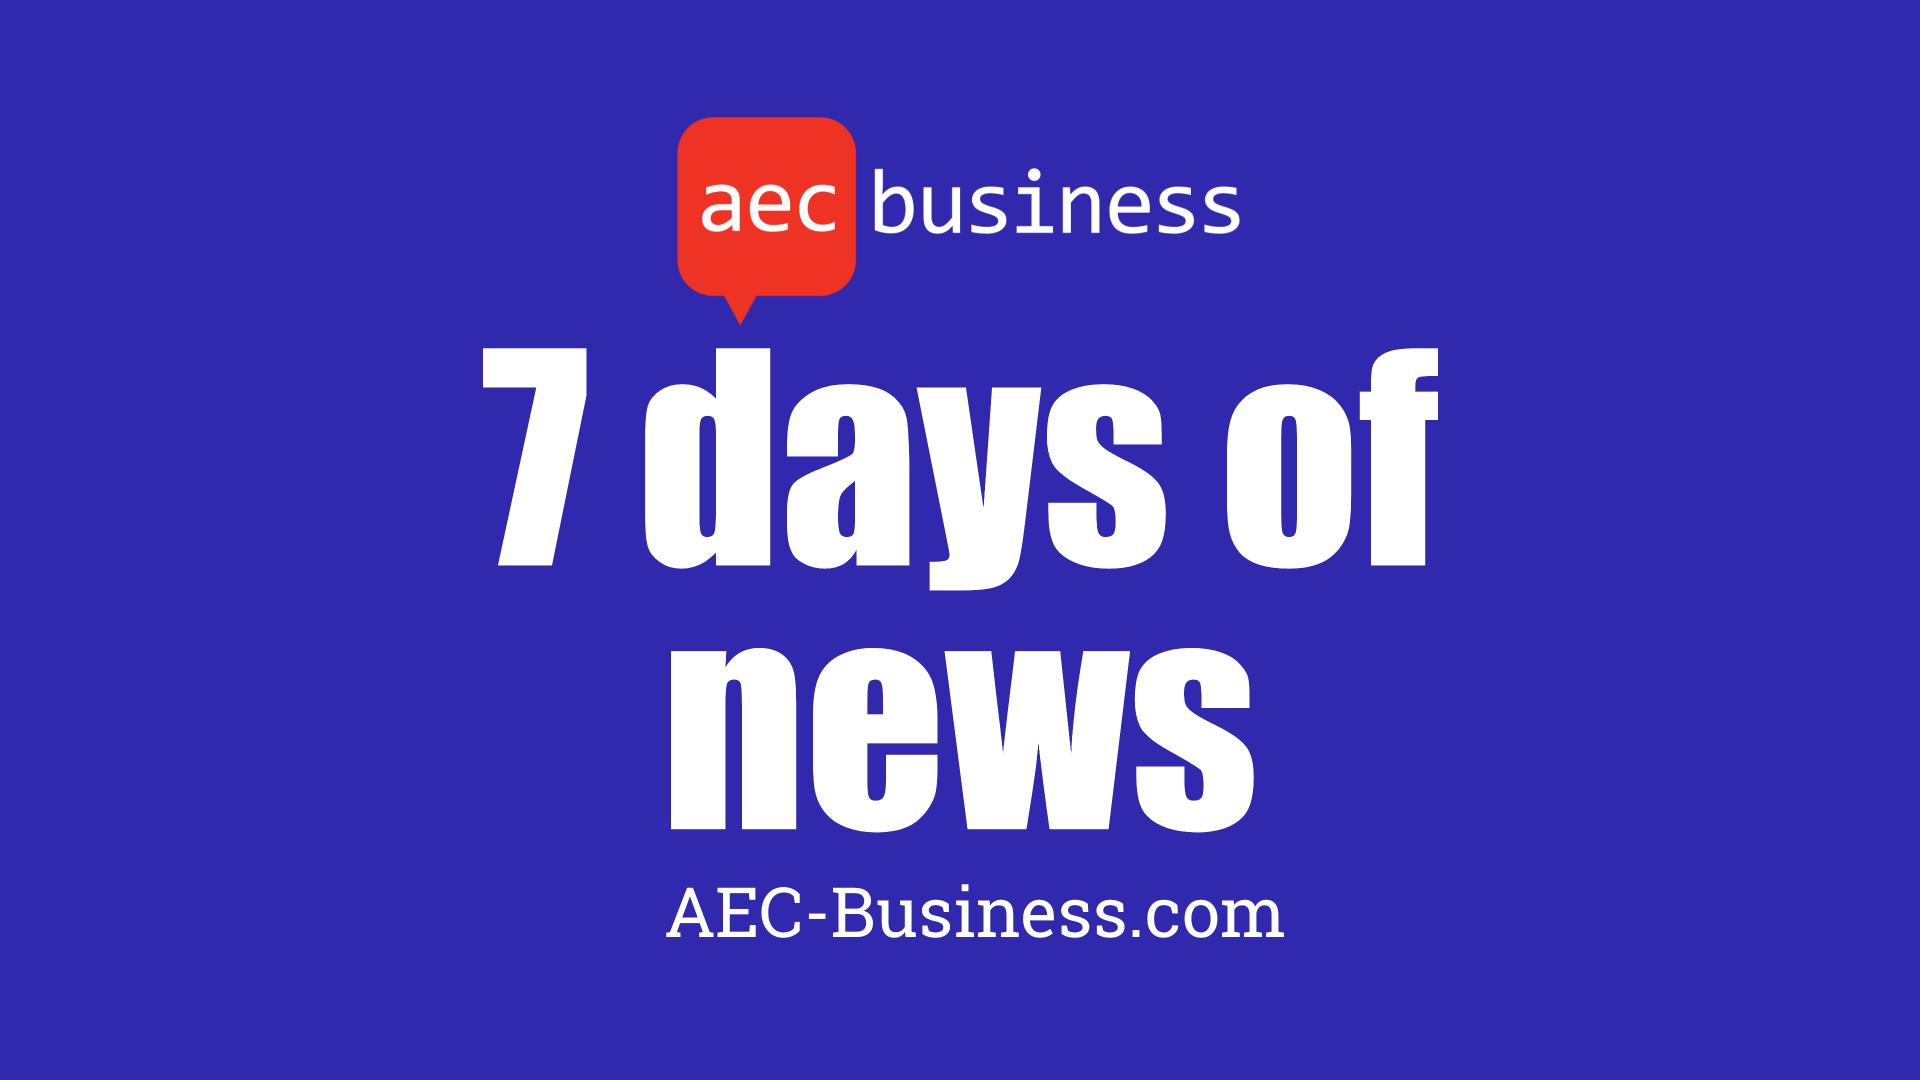 7 days of news